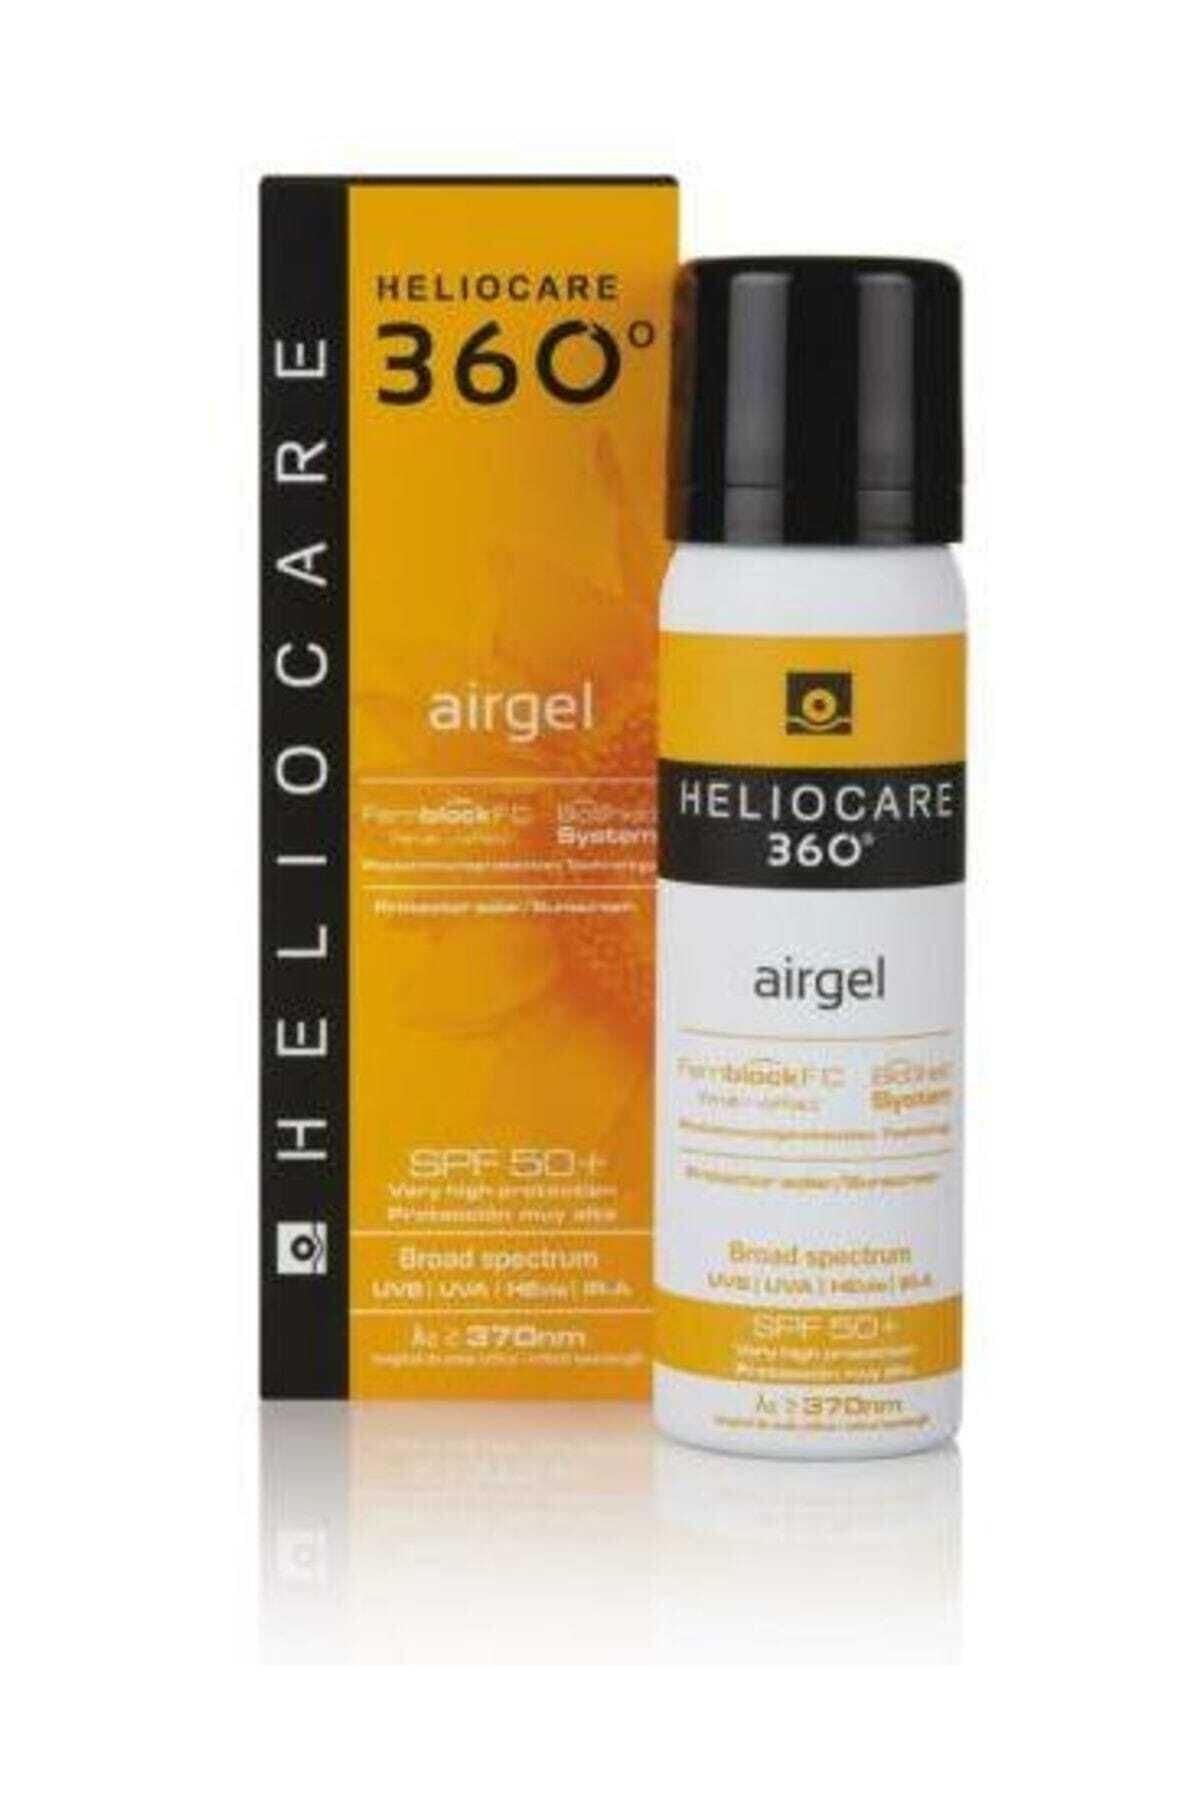 Heliocare 360 Air Gel Oil-free Spf50 50 Ml 1